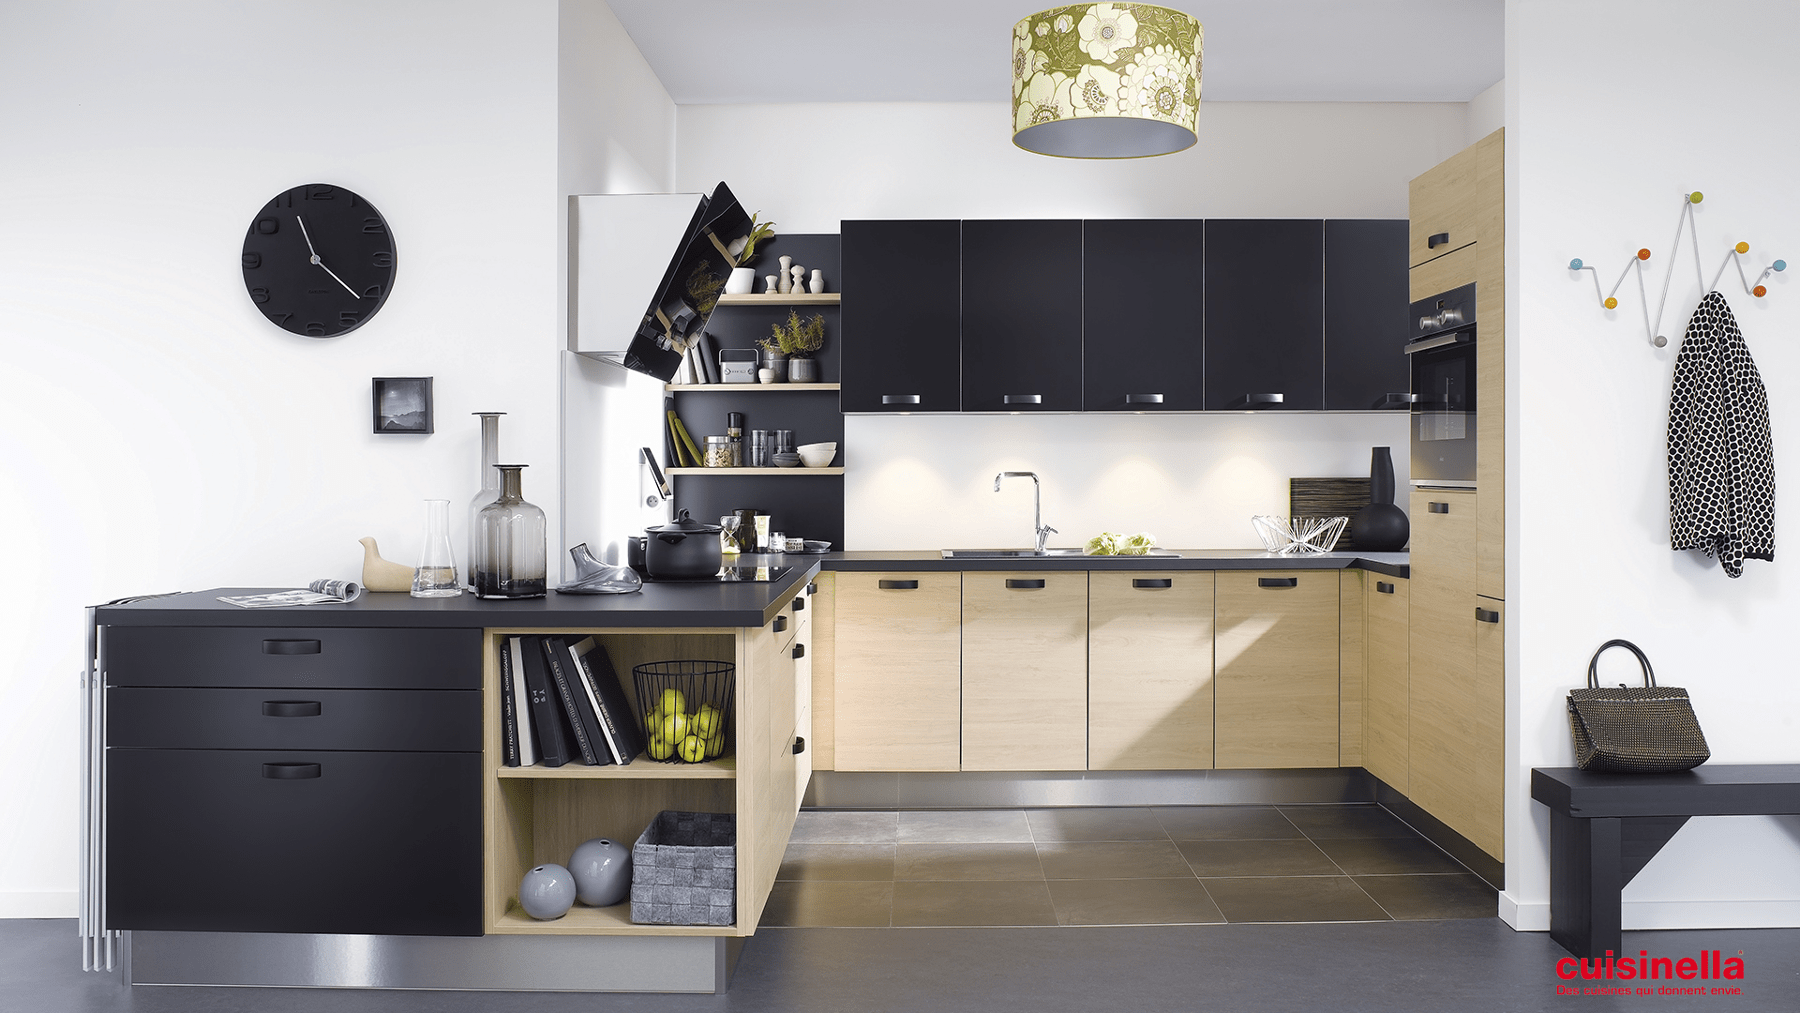 quel carrelage choisir pour ma cuisine cuisinity. Black Bedroom Furniture Sets. Home Design Ideas